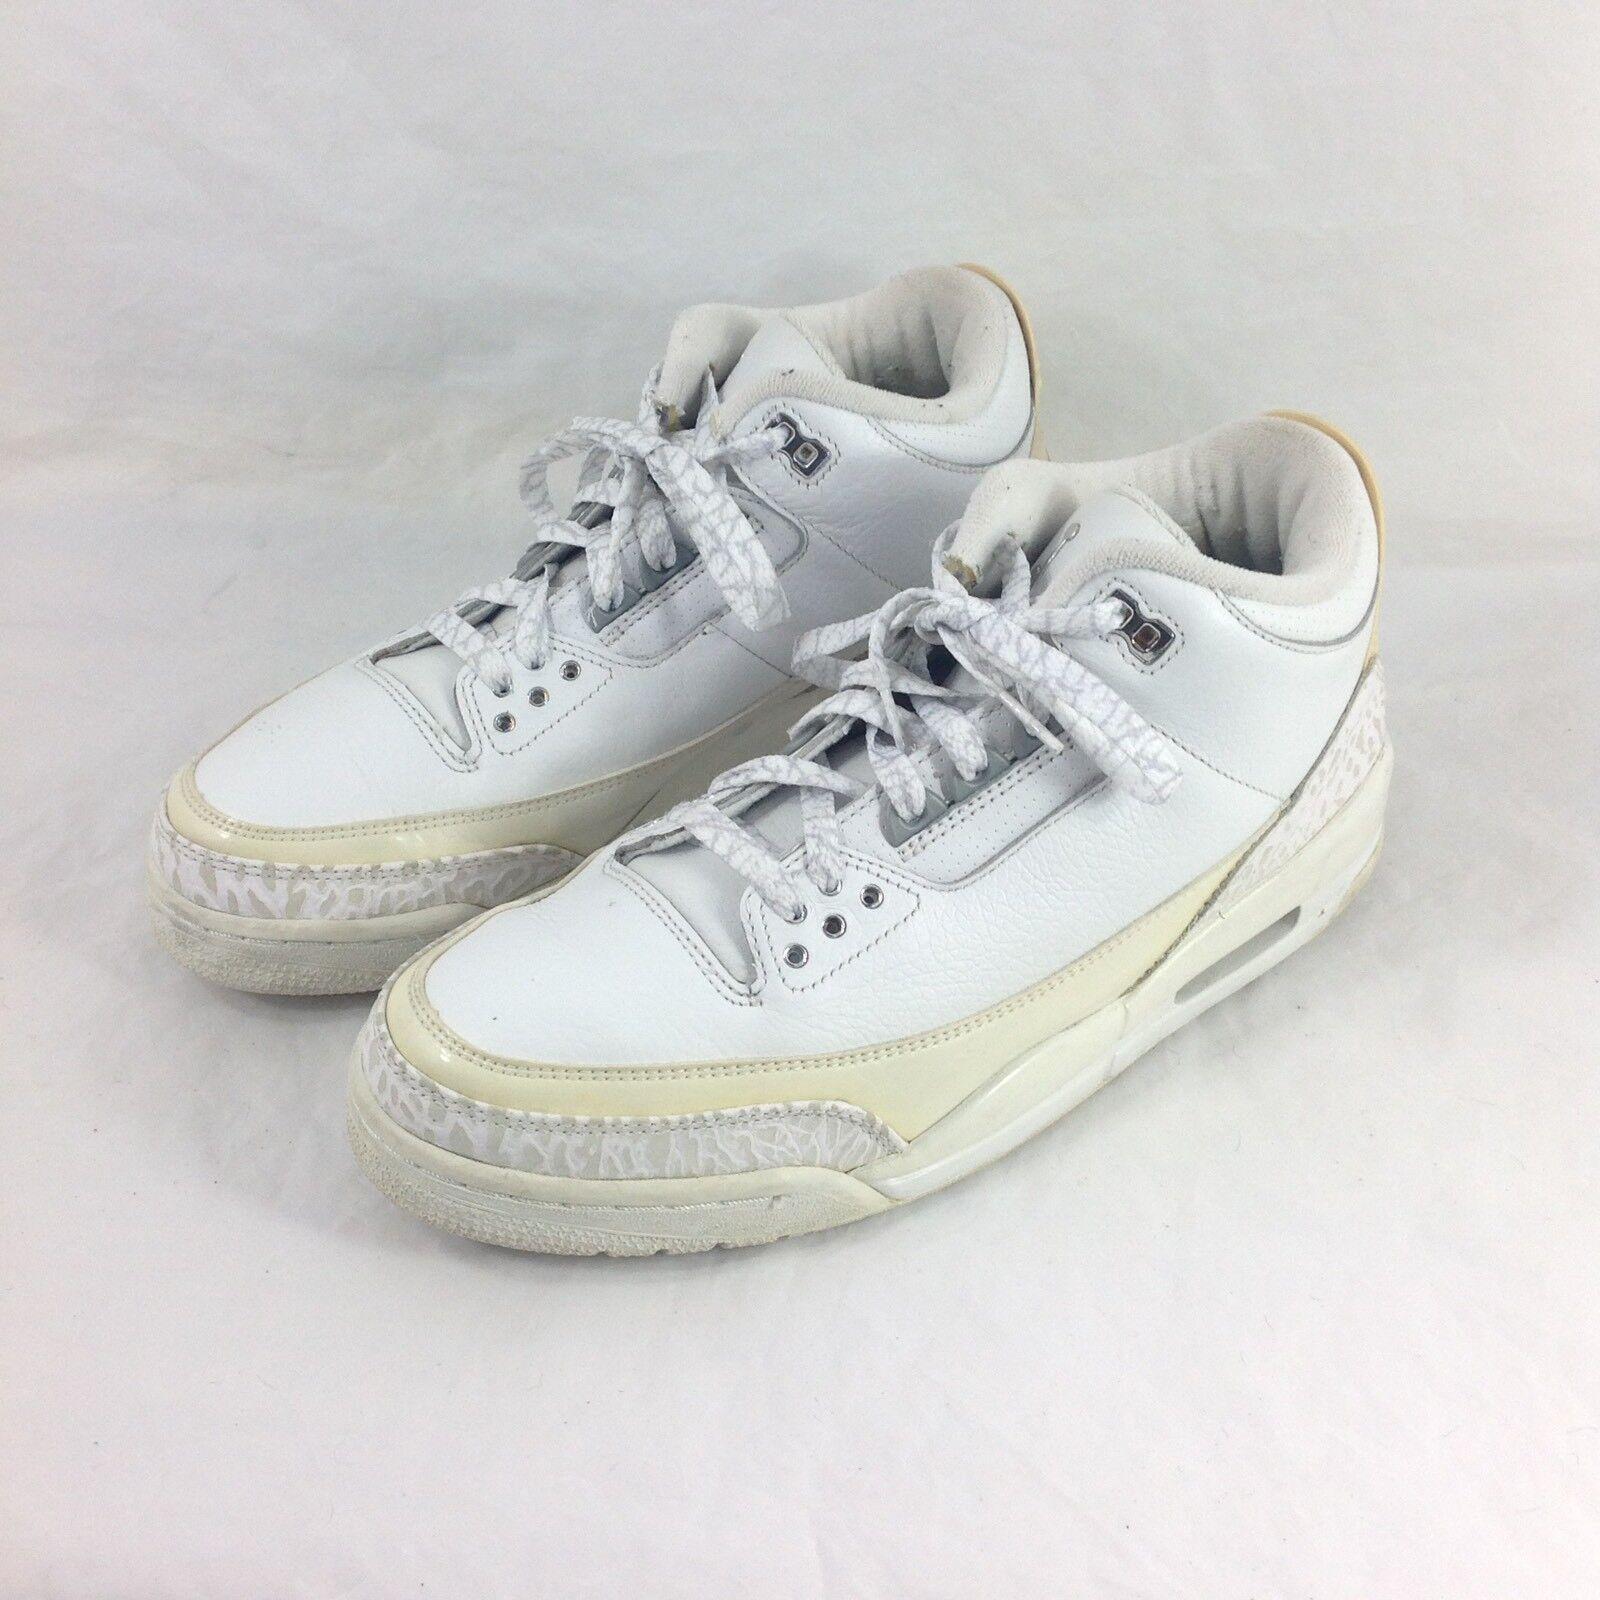 Nike air jordan jordan jordan 3 2007 vintage uomini taglia 10 soldi scarpe da ginnastica136064-103 bianco puro 7e7027